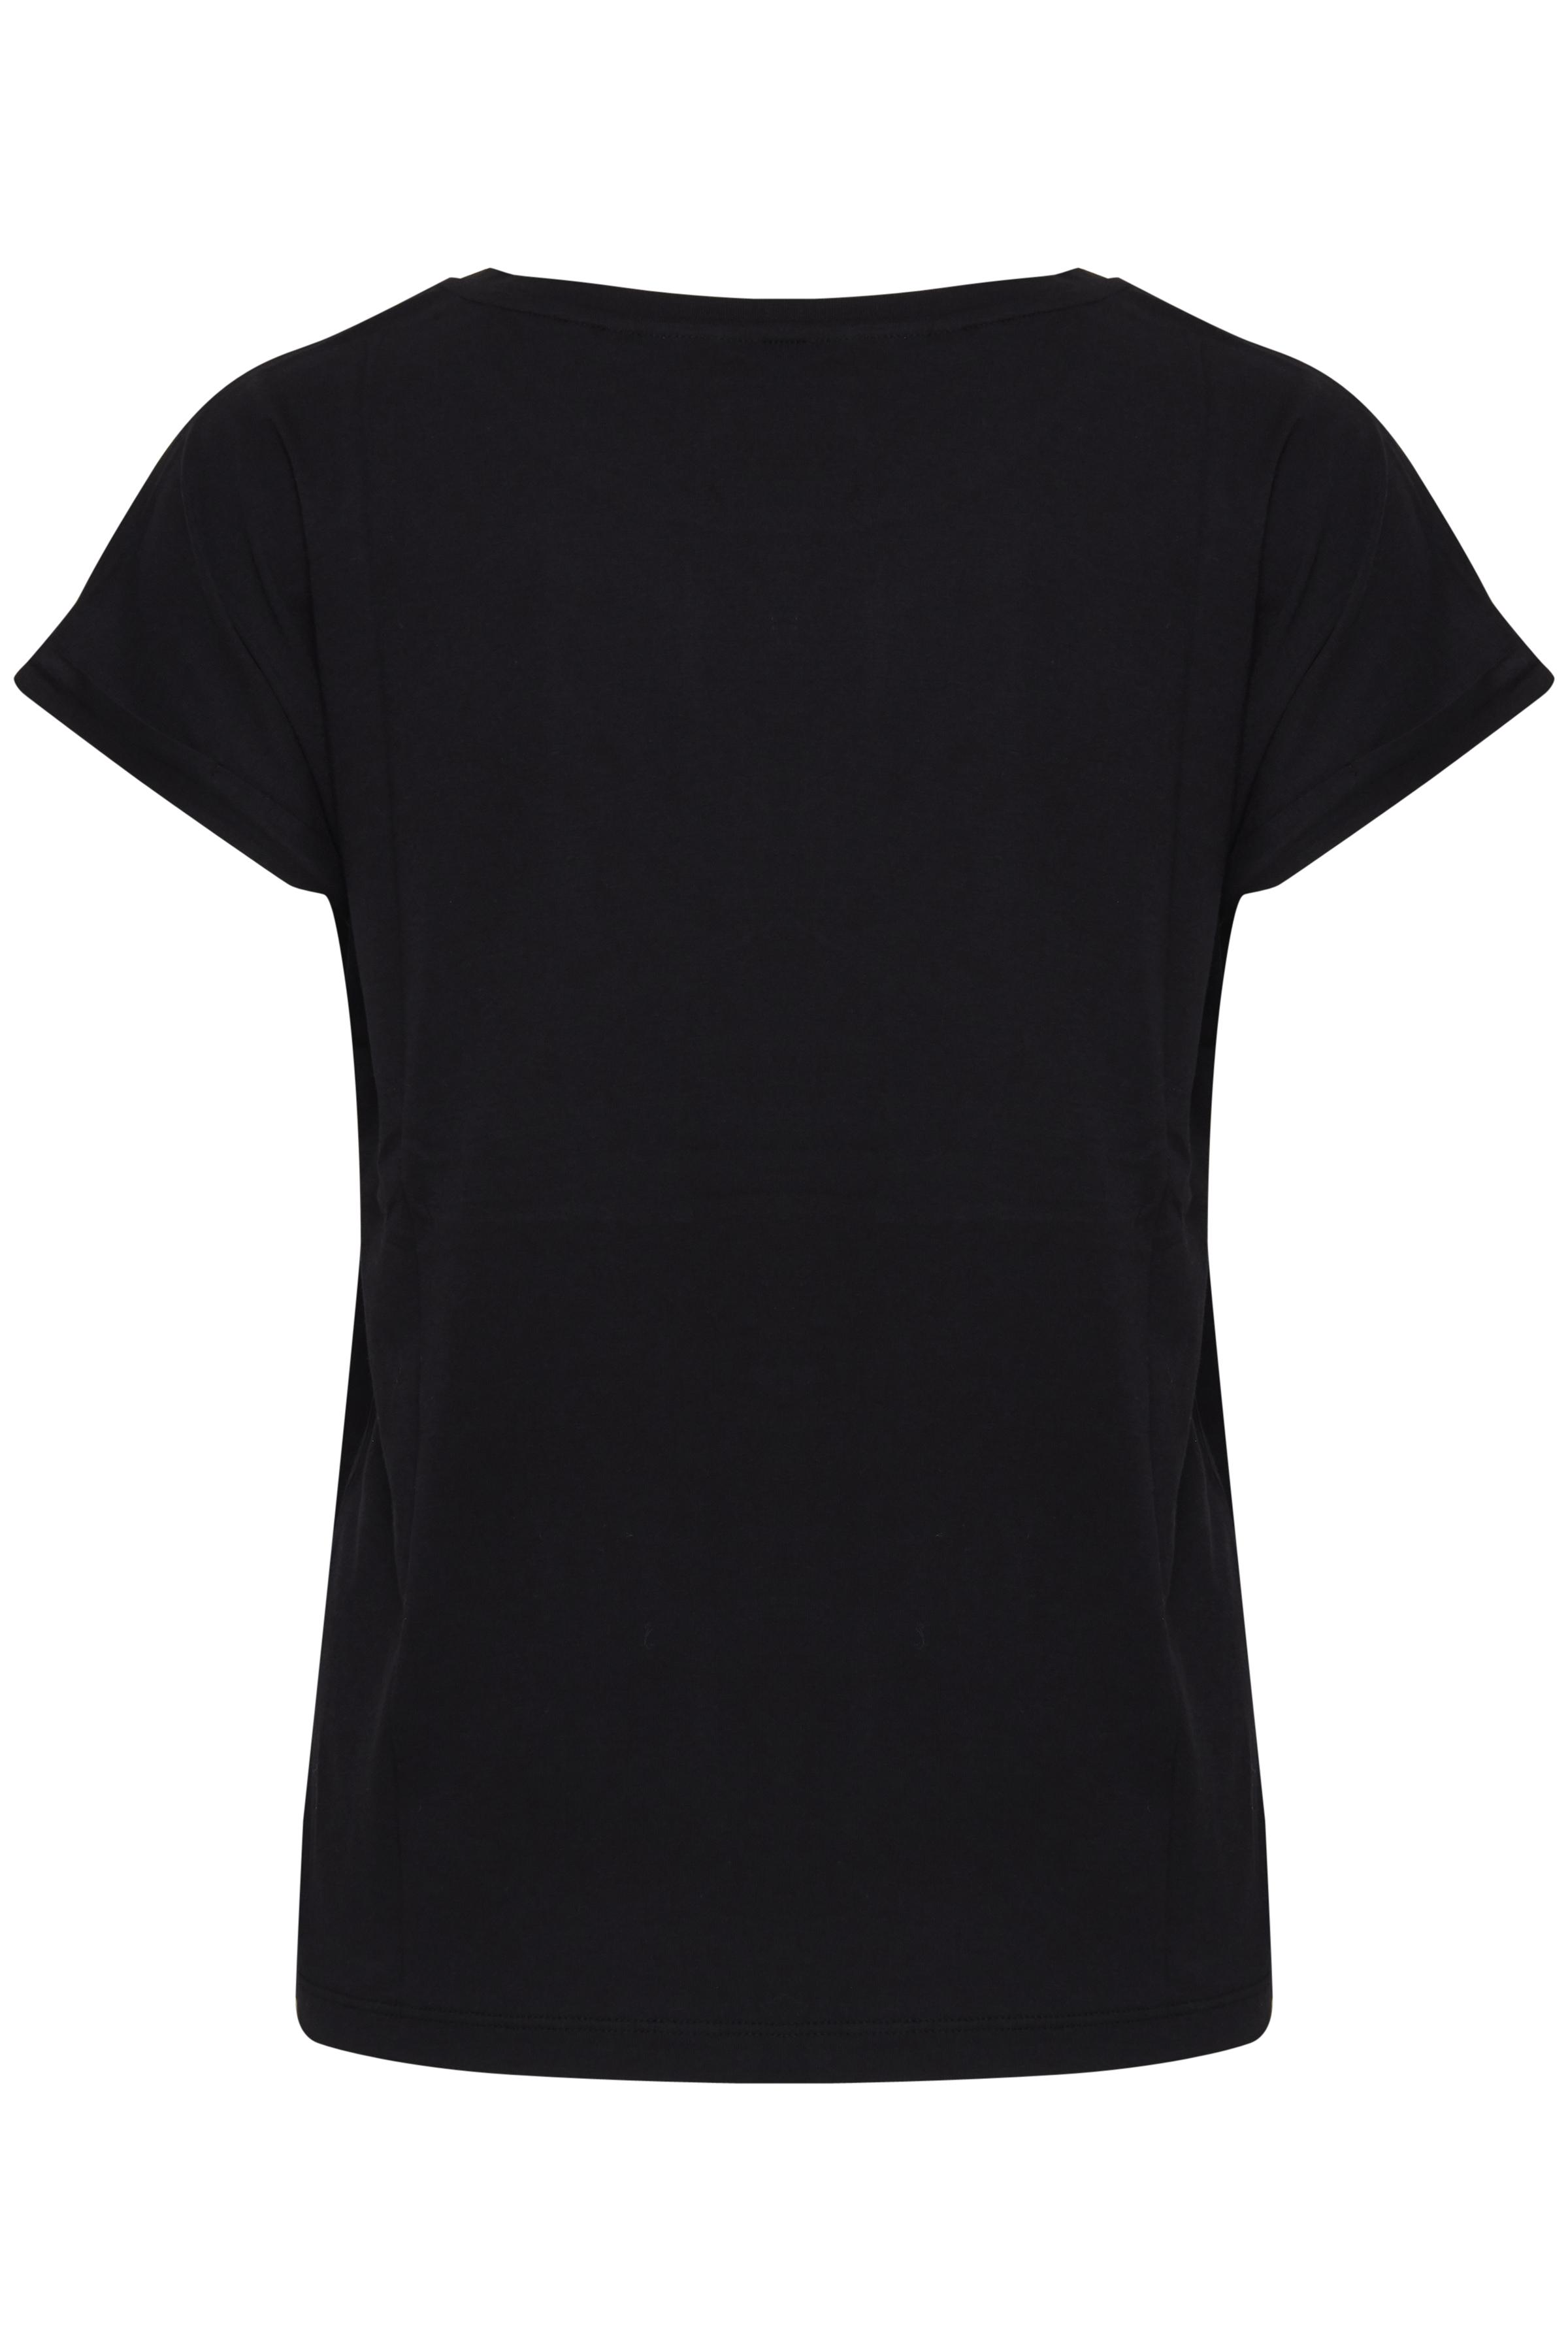 Black T-Shirt – Køb Black T-Shirt fra str. S-XXL her